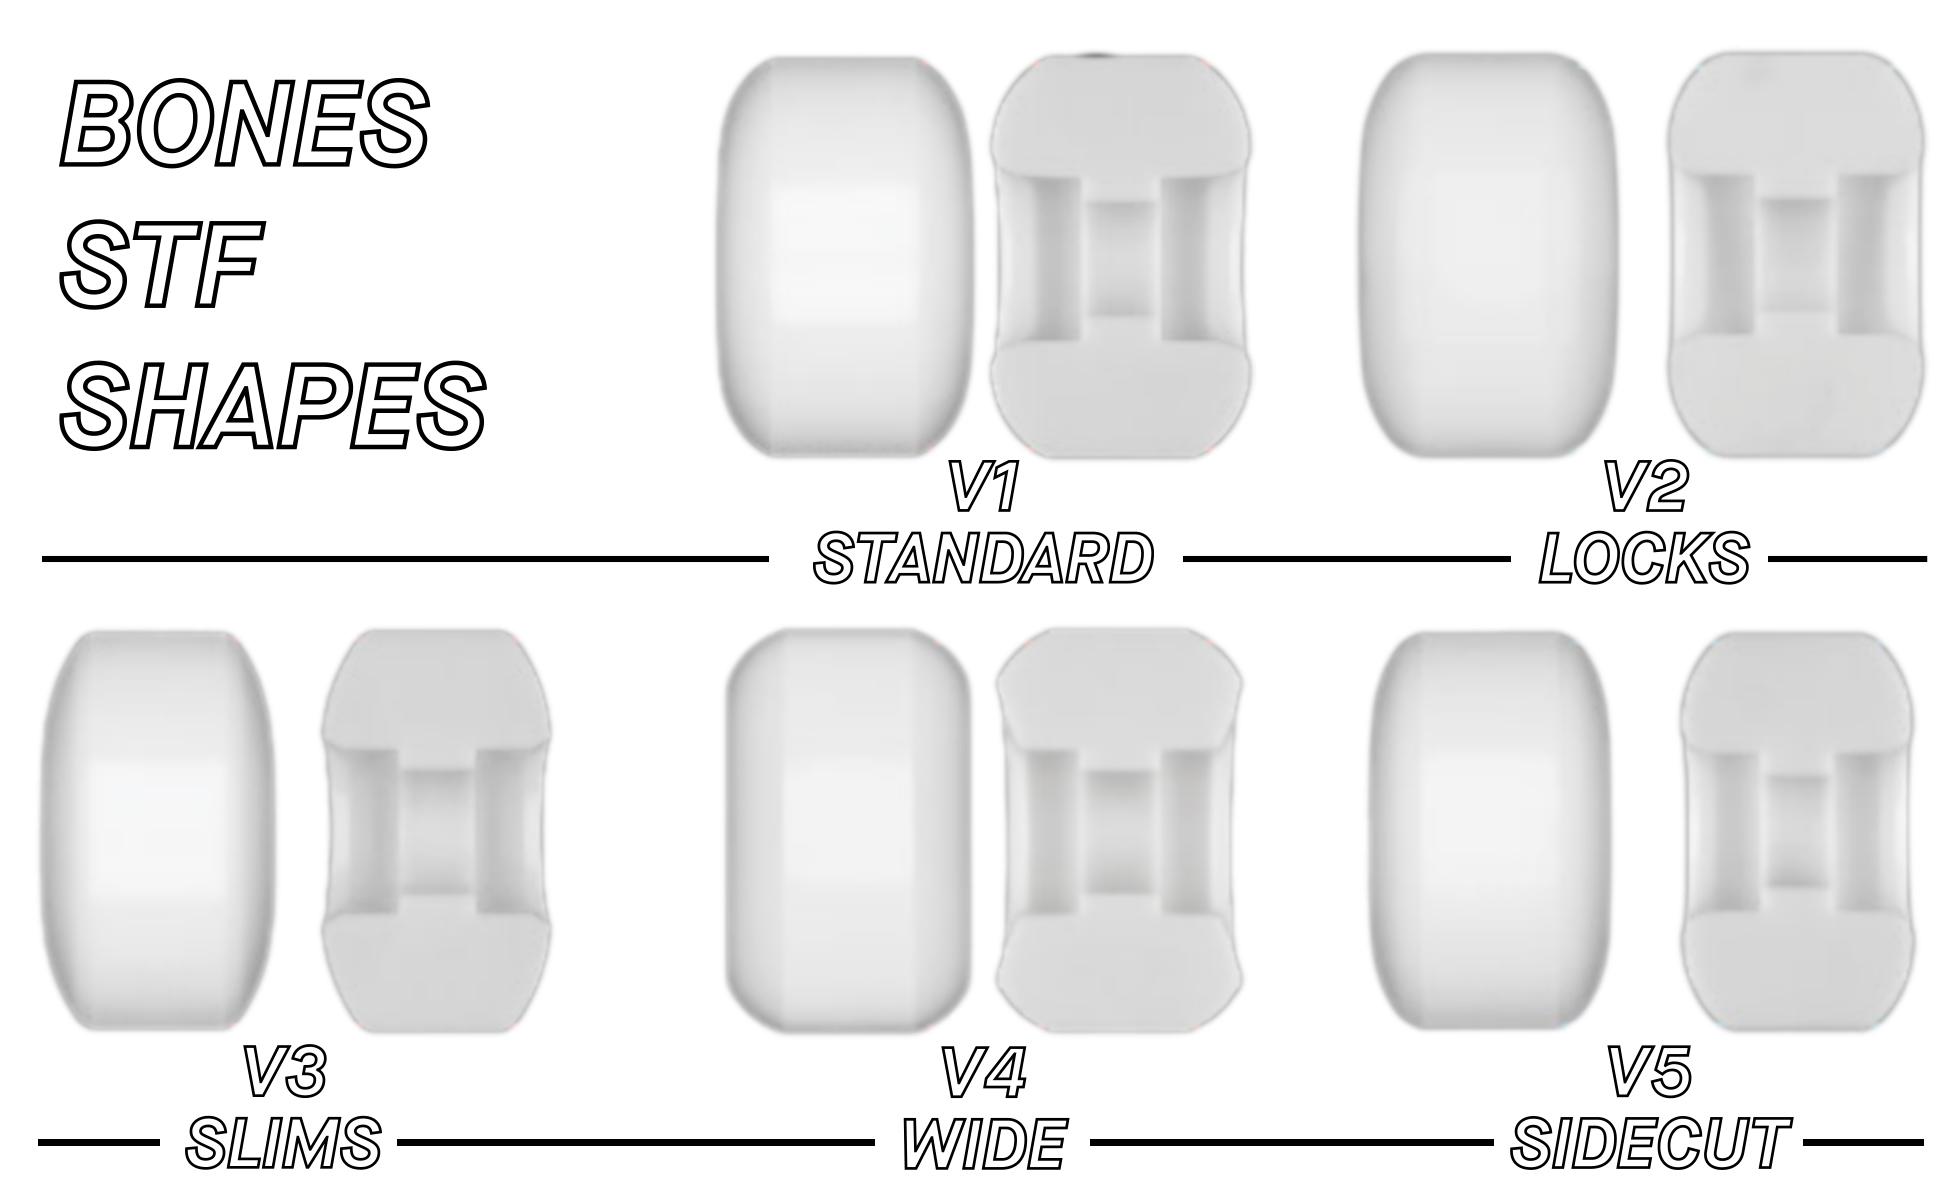 Bones STF Formula - Bones Wheels Buyers guide